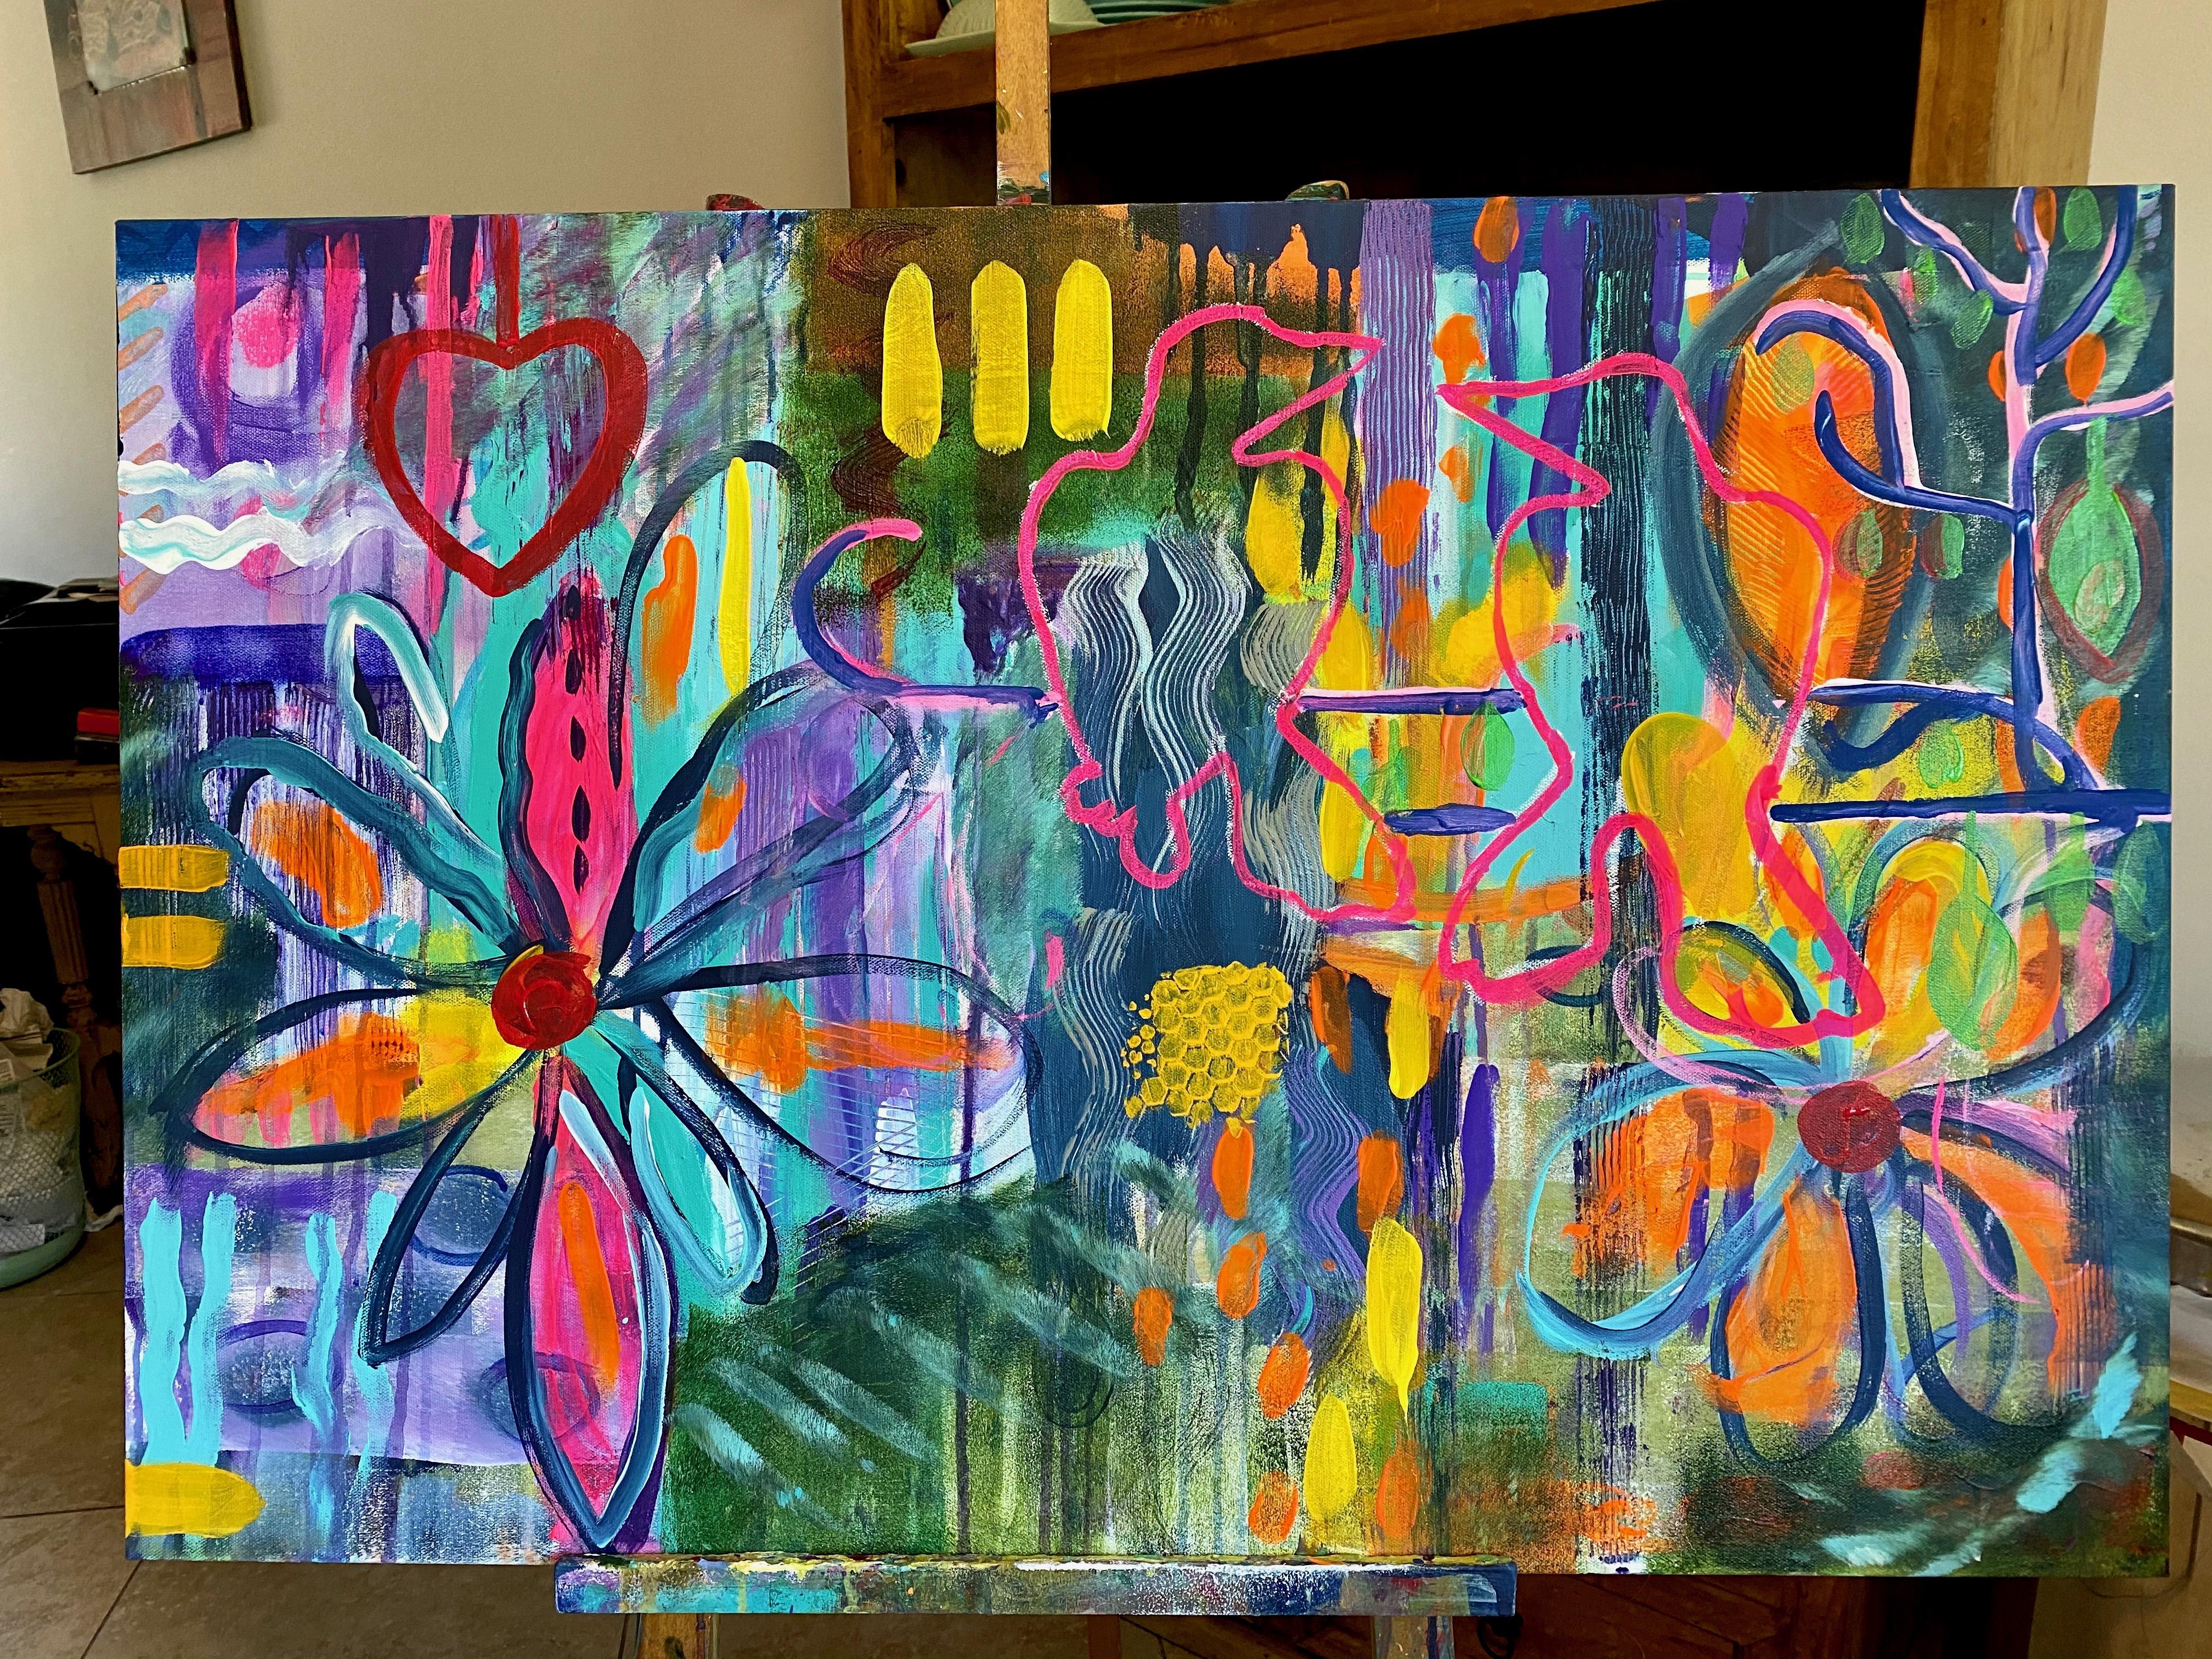 Artist pre-painting